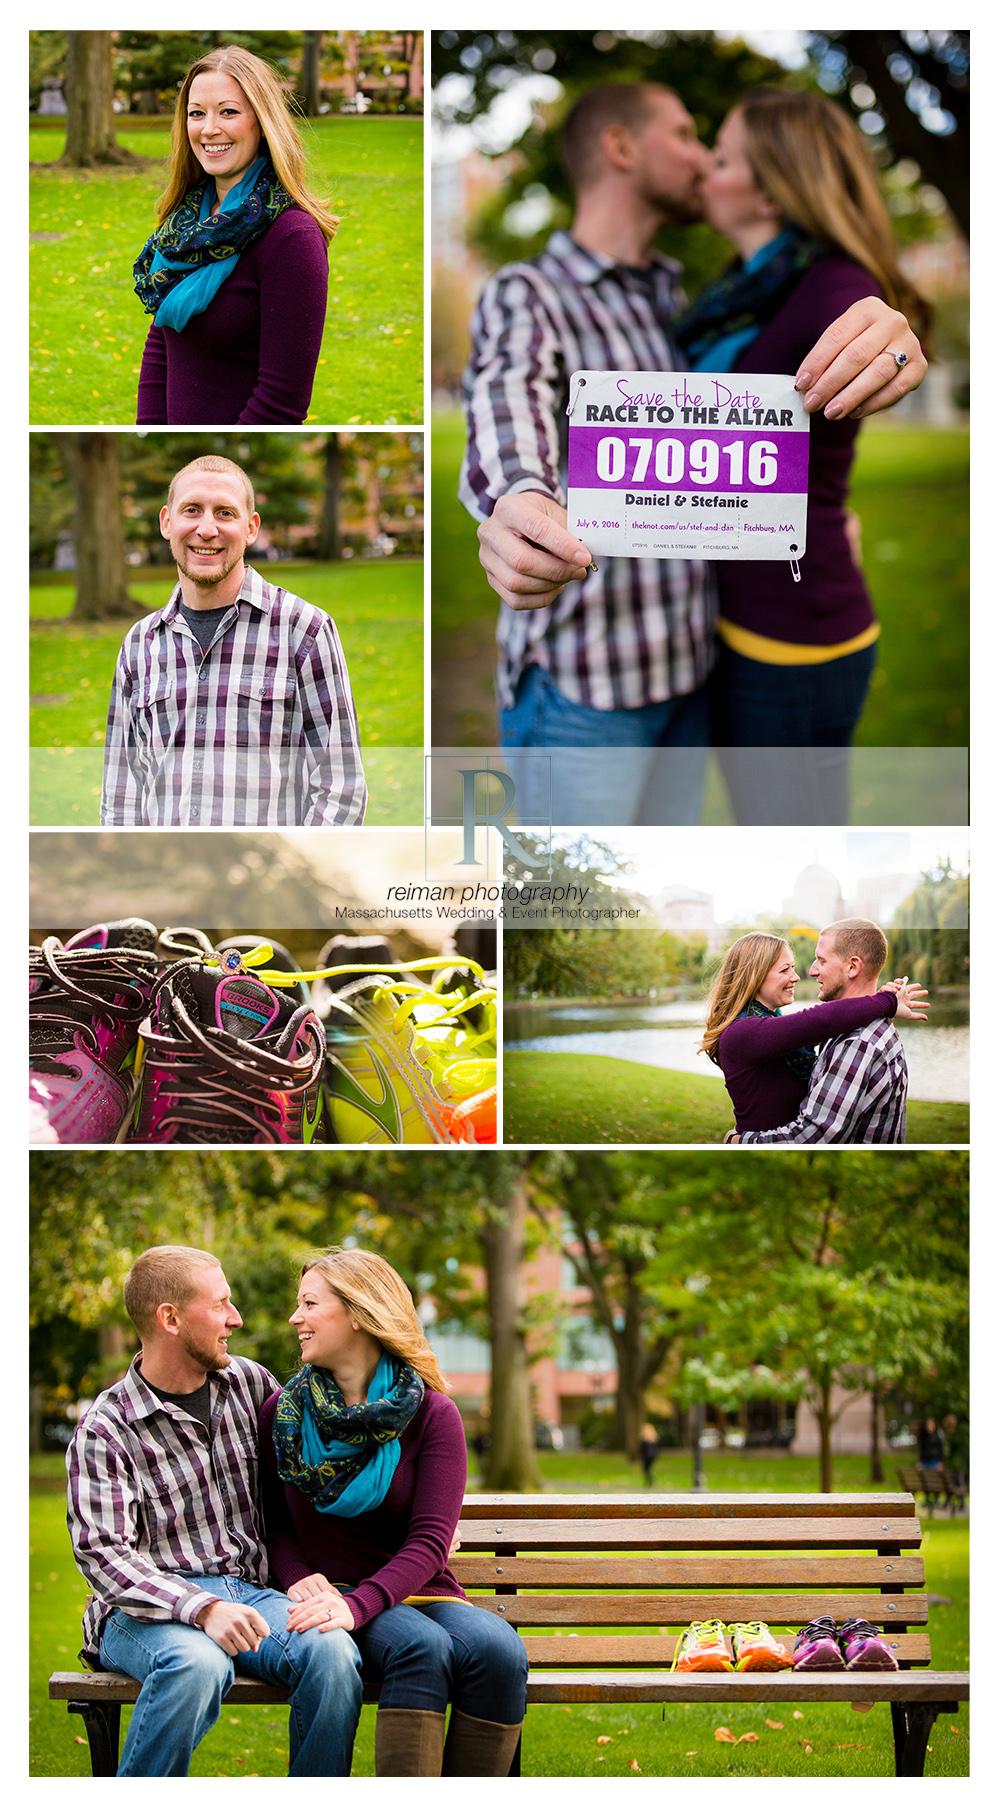 Reiman Photography, engagement, Boston Public Garden, Autumn, Fall, runner, purple, Runners Engagement